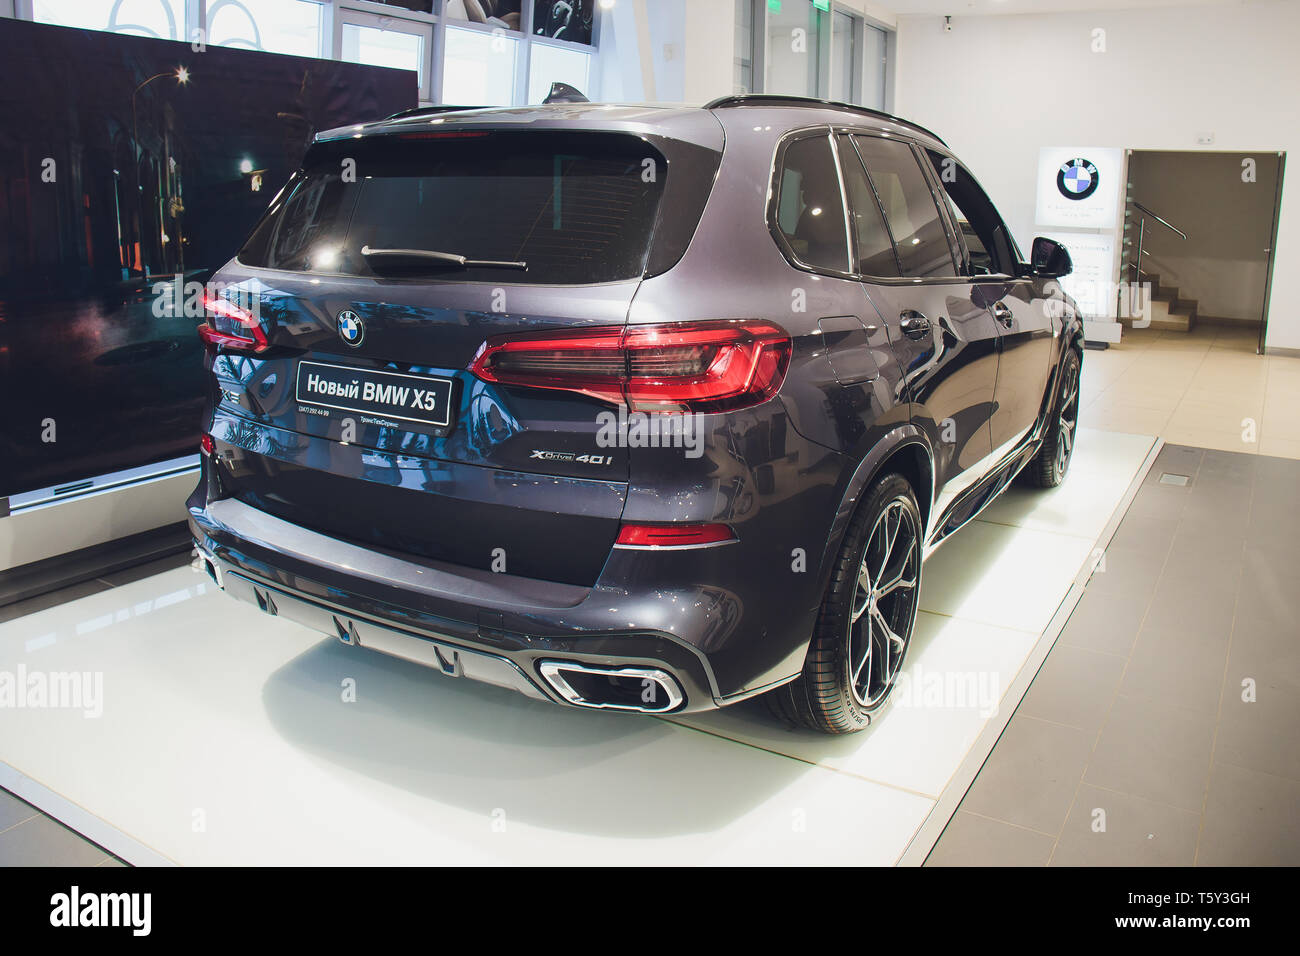 Ufa, Russia, 12 December, 2018: metallic graphite gray BMW X5. - Stock Image